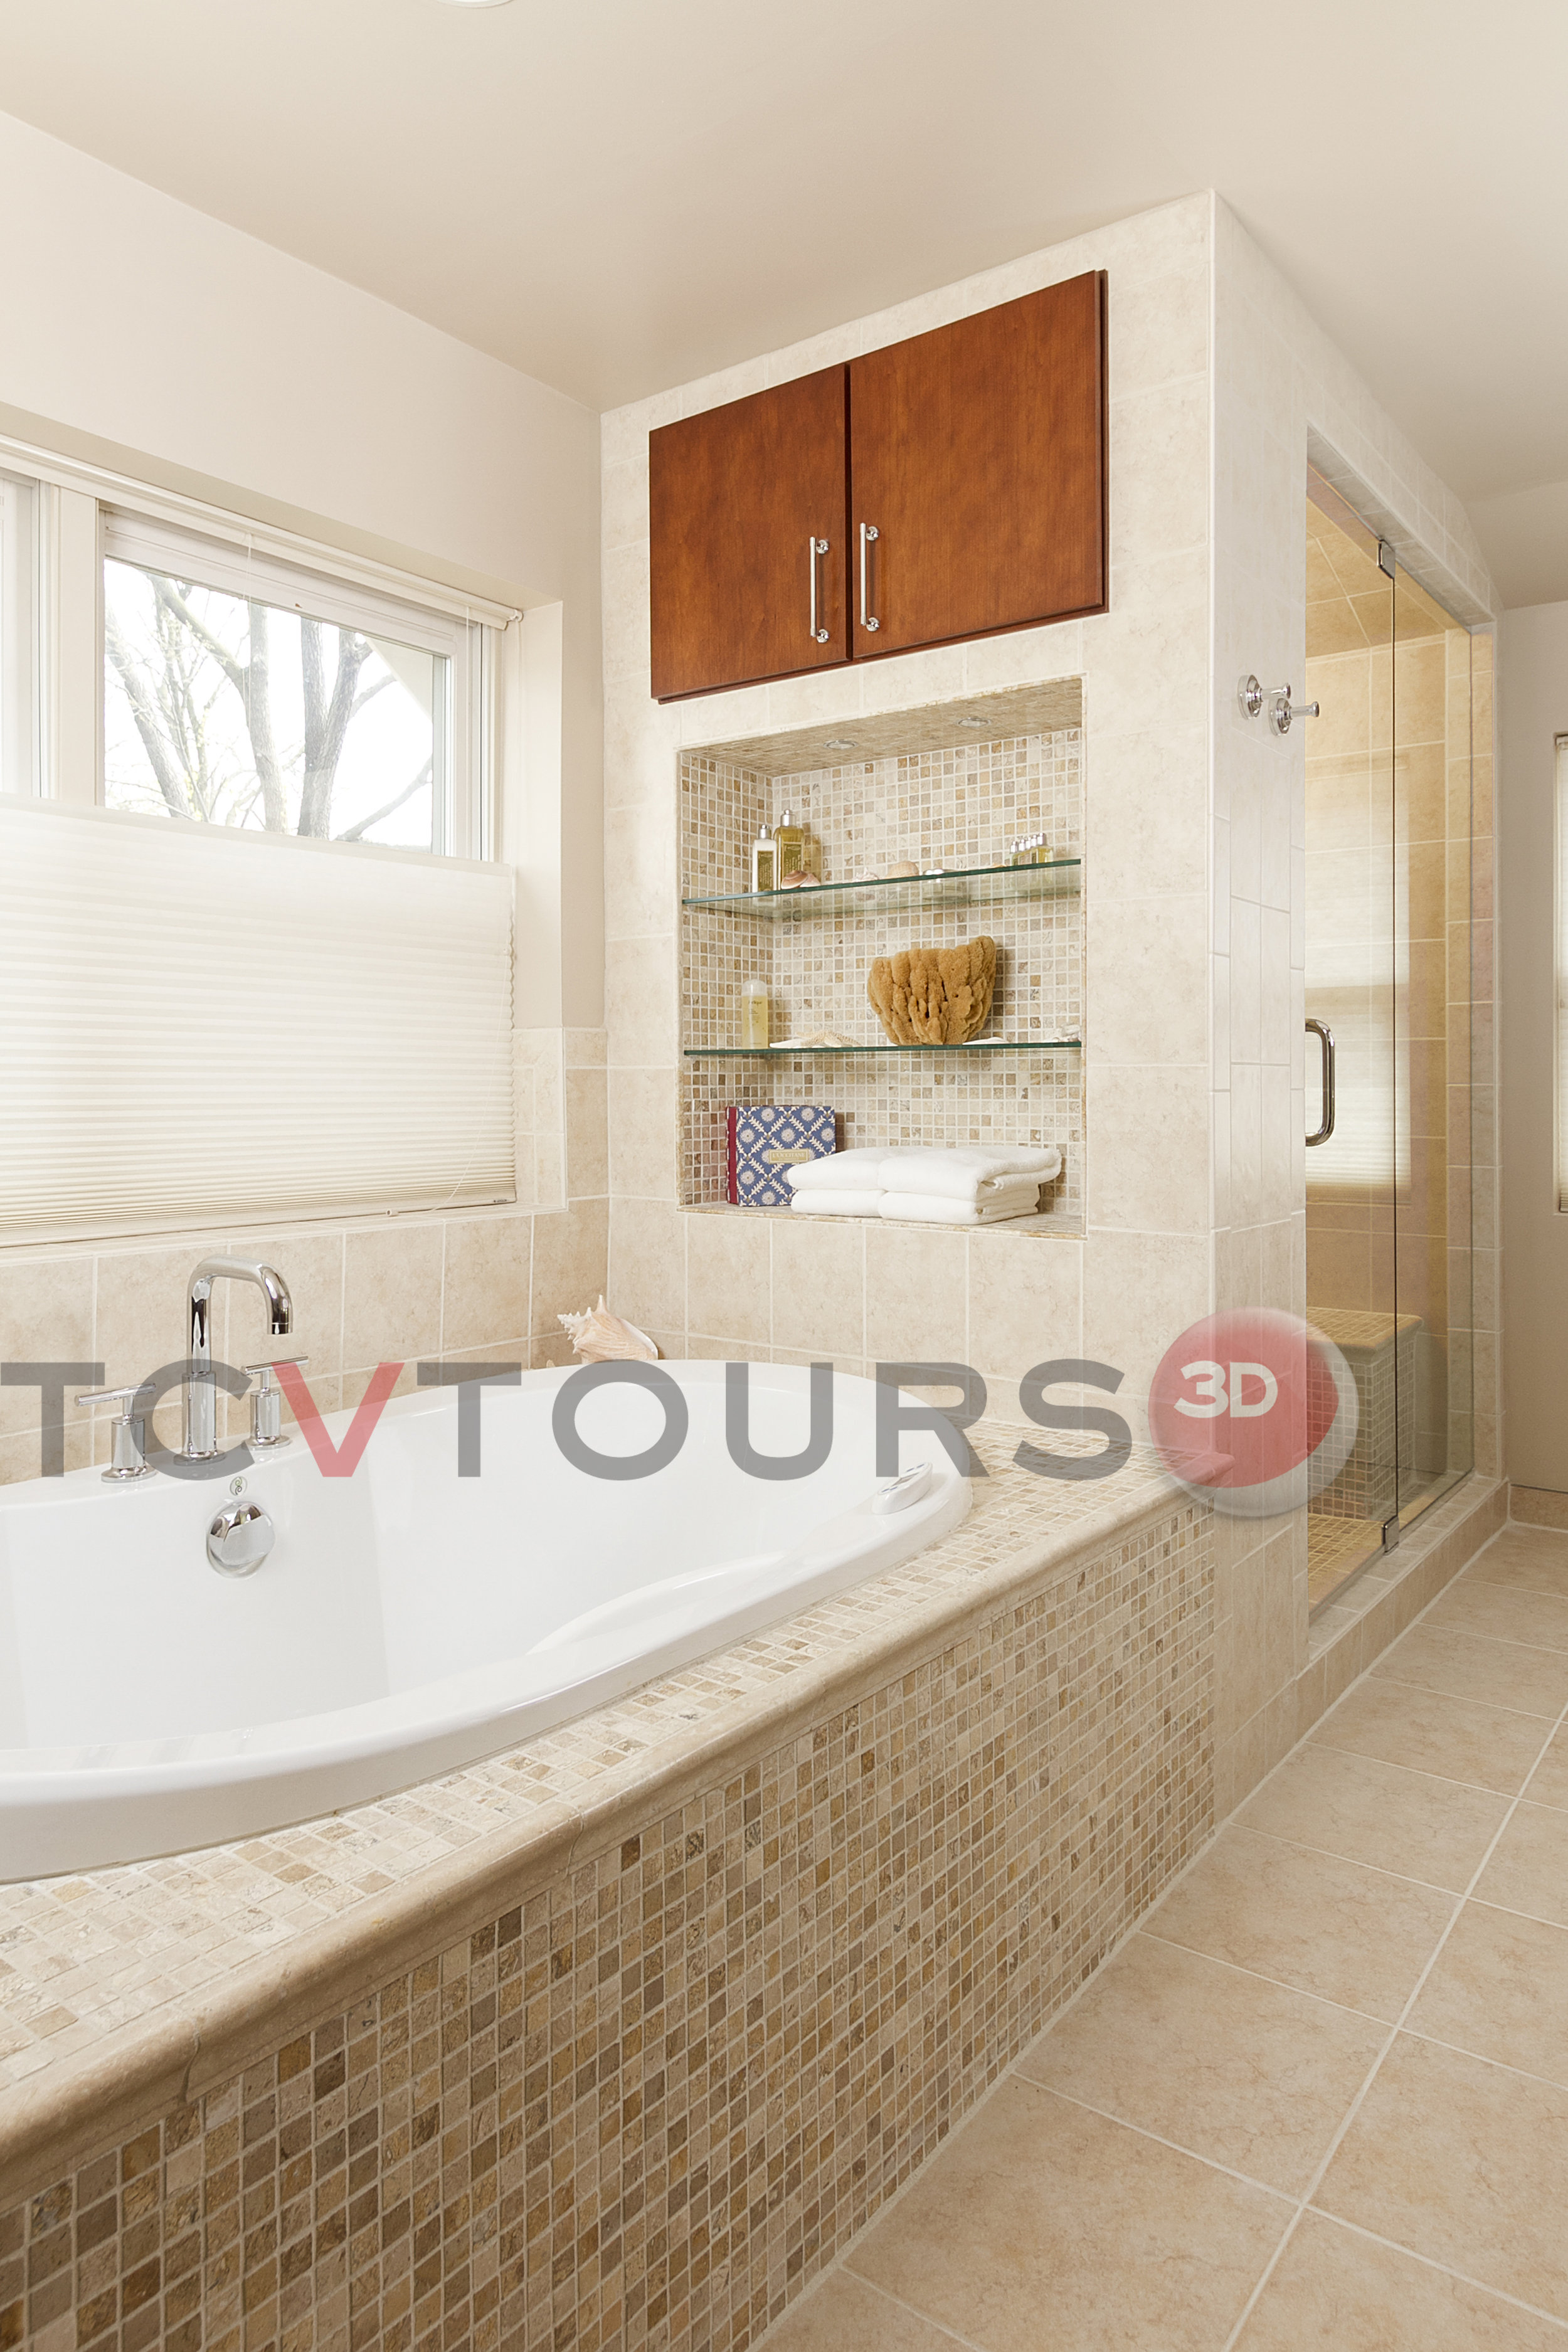 030_bathroom bath and shower H20.jpg